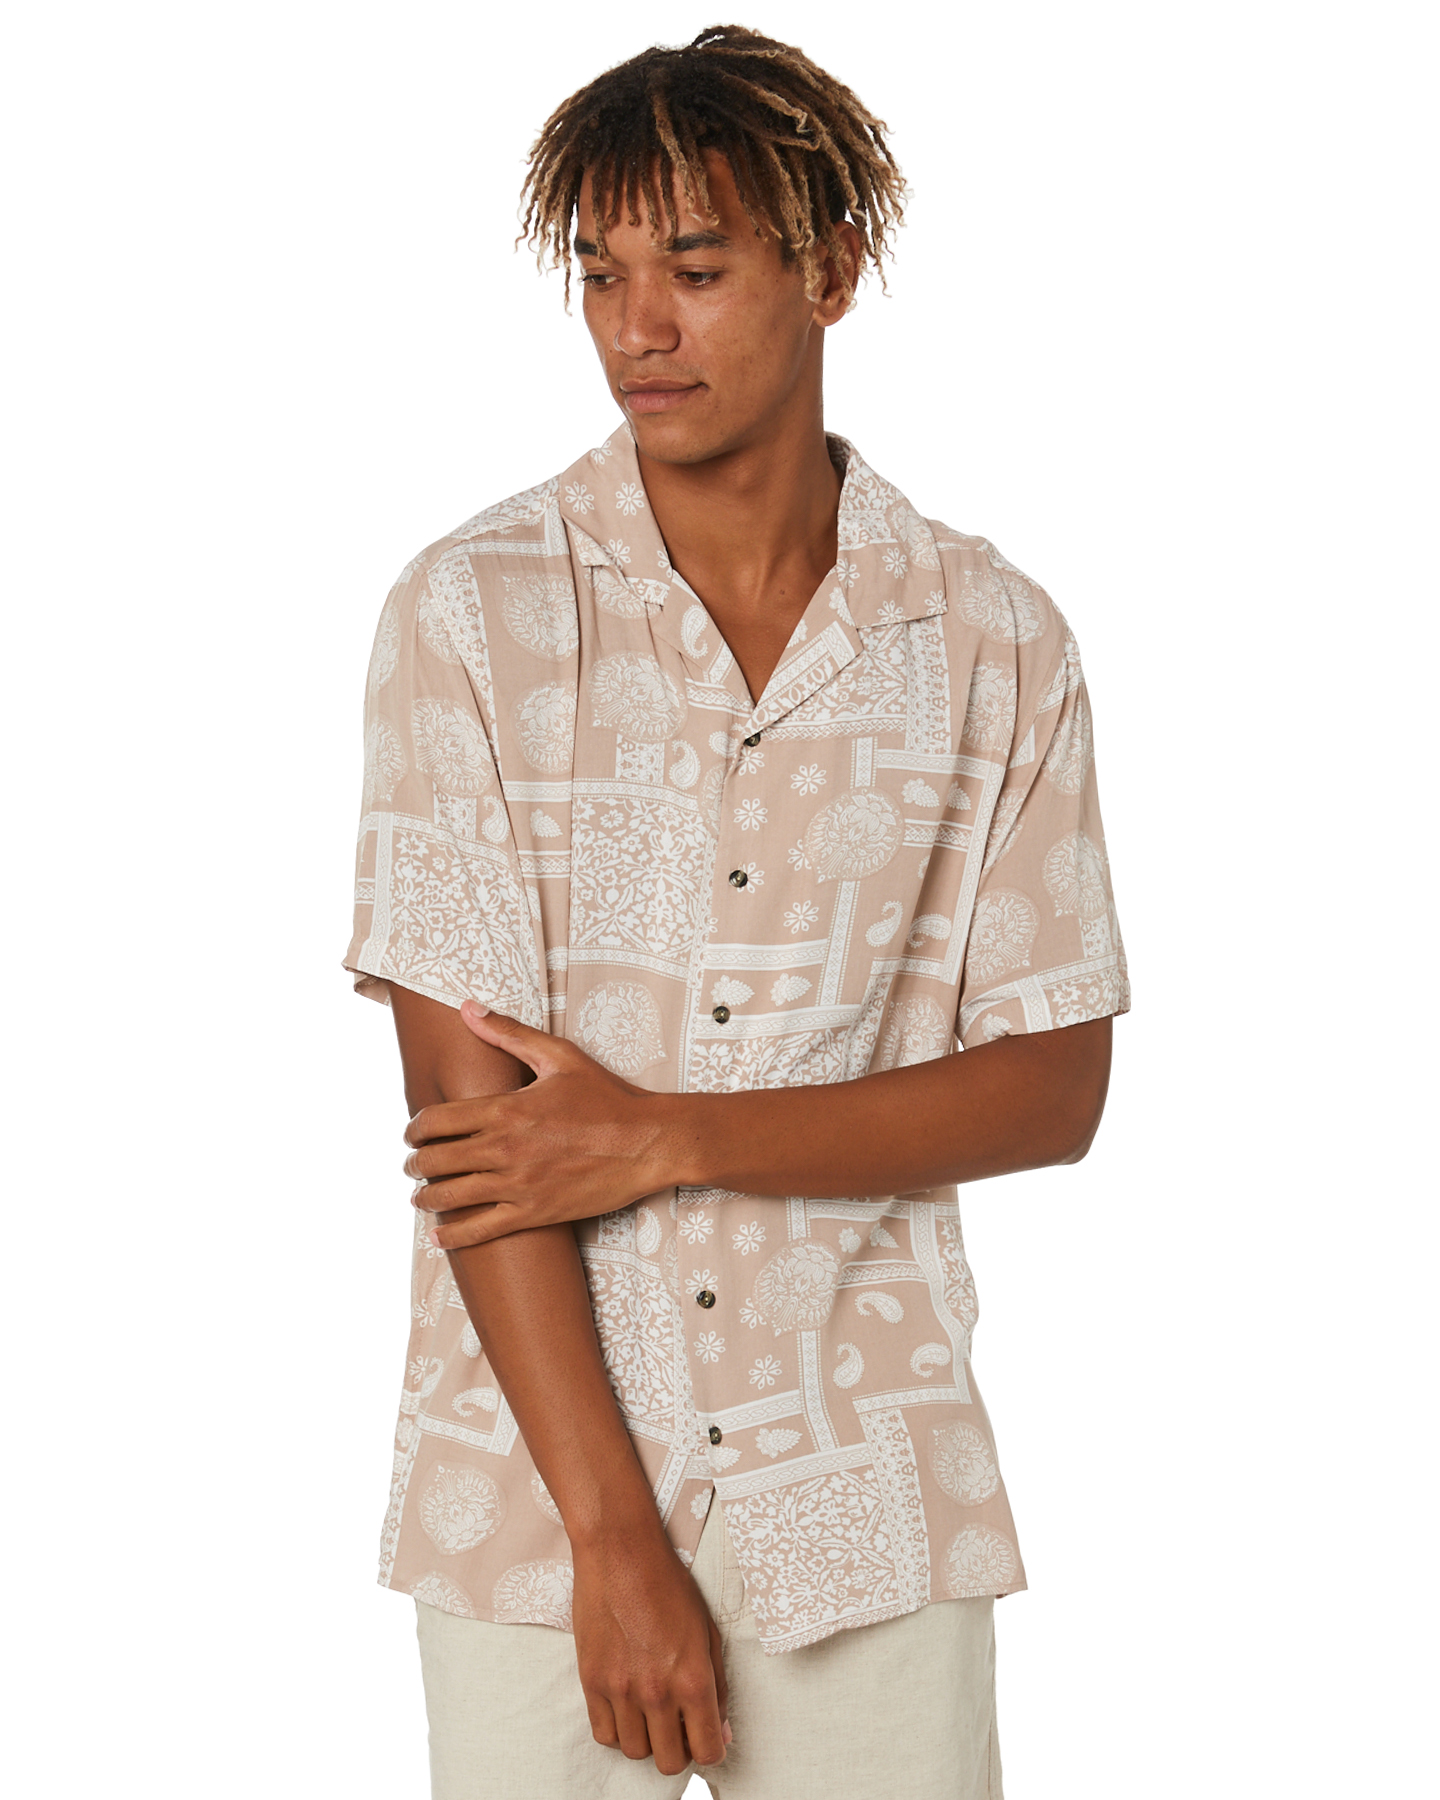 Rusty Dancing Doona Mens Short Sleeve Rayon Shirt Humus Humus